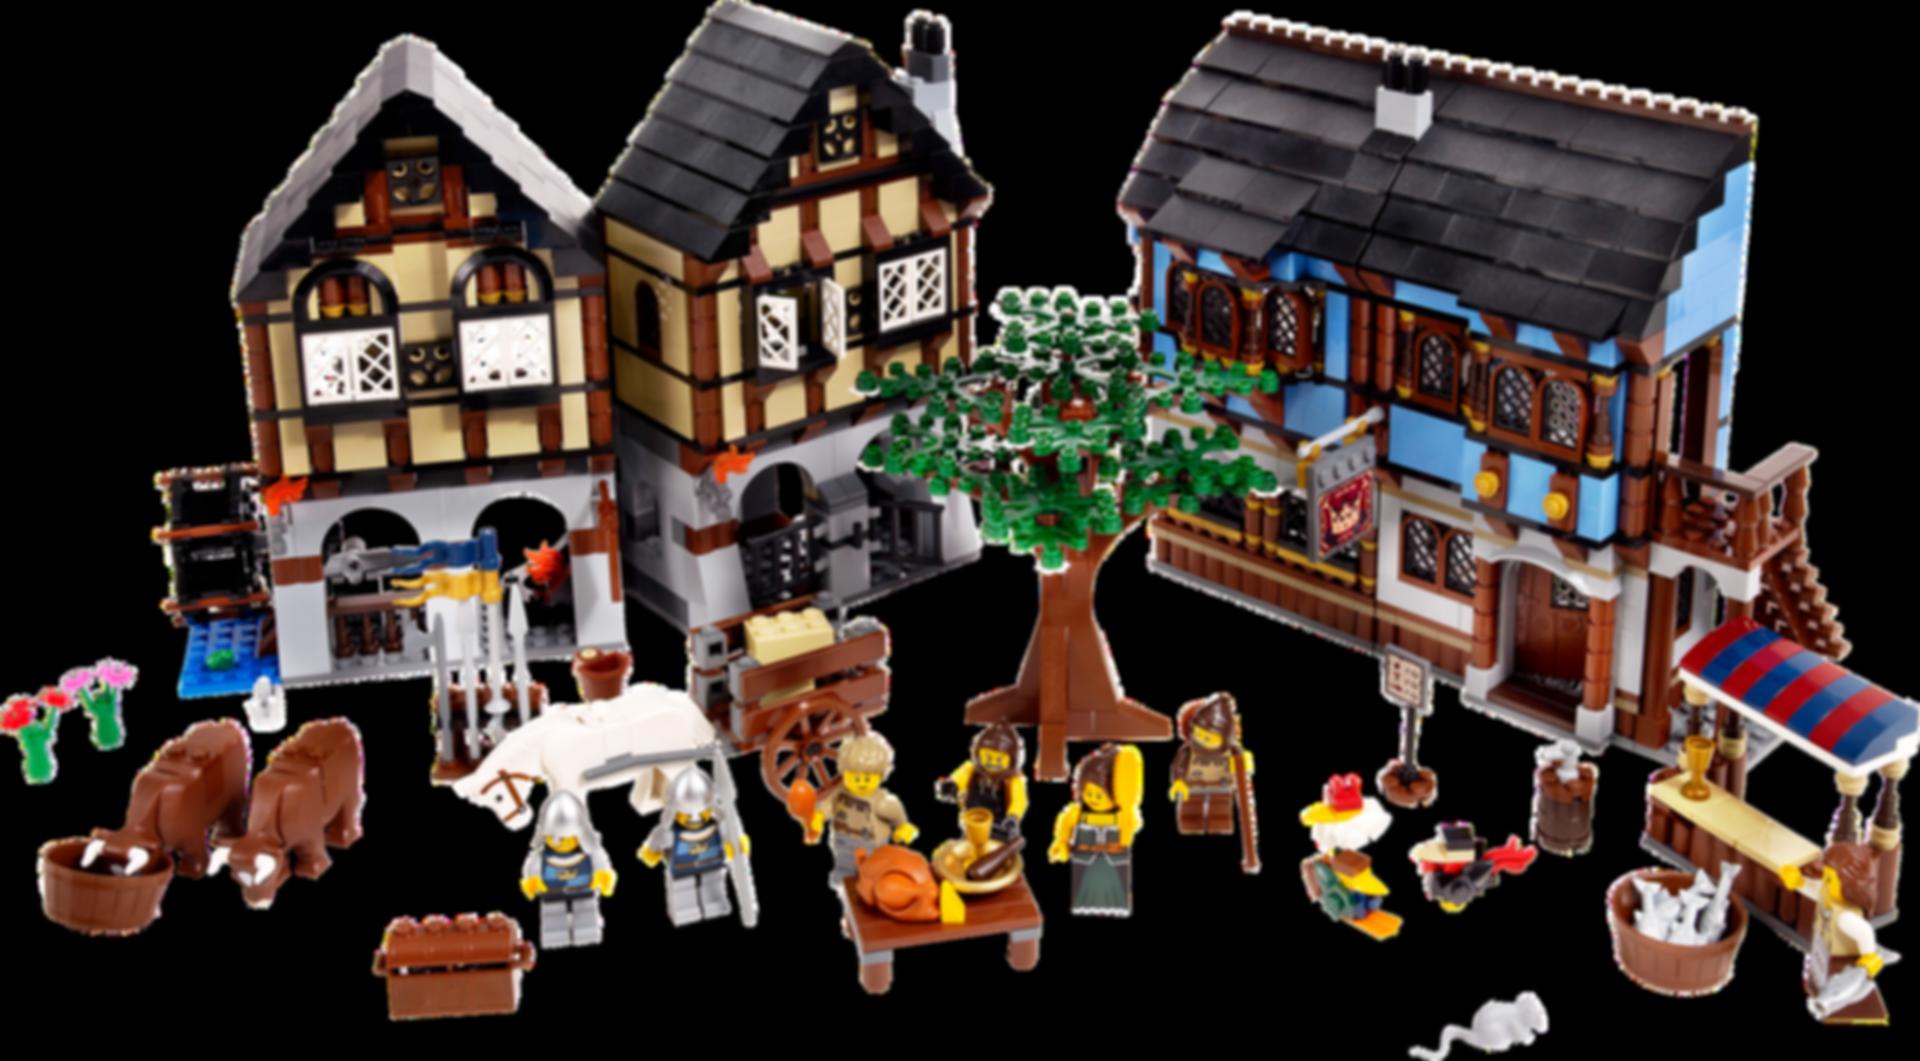 Medieval Market Village components